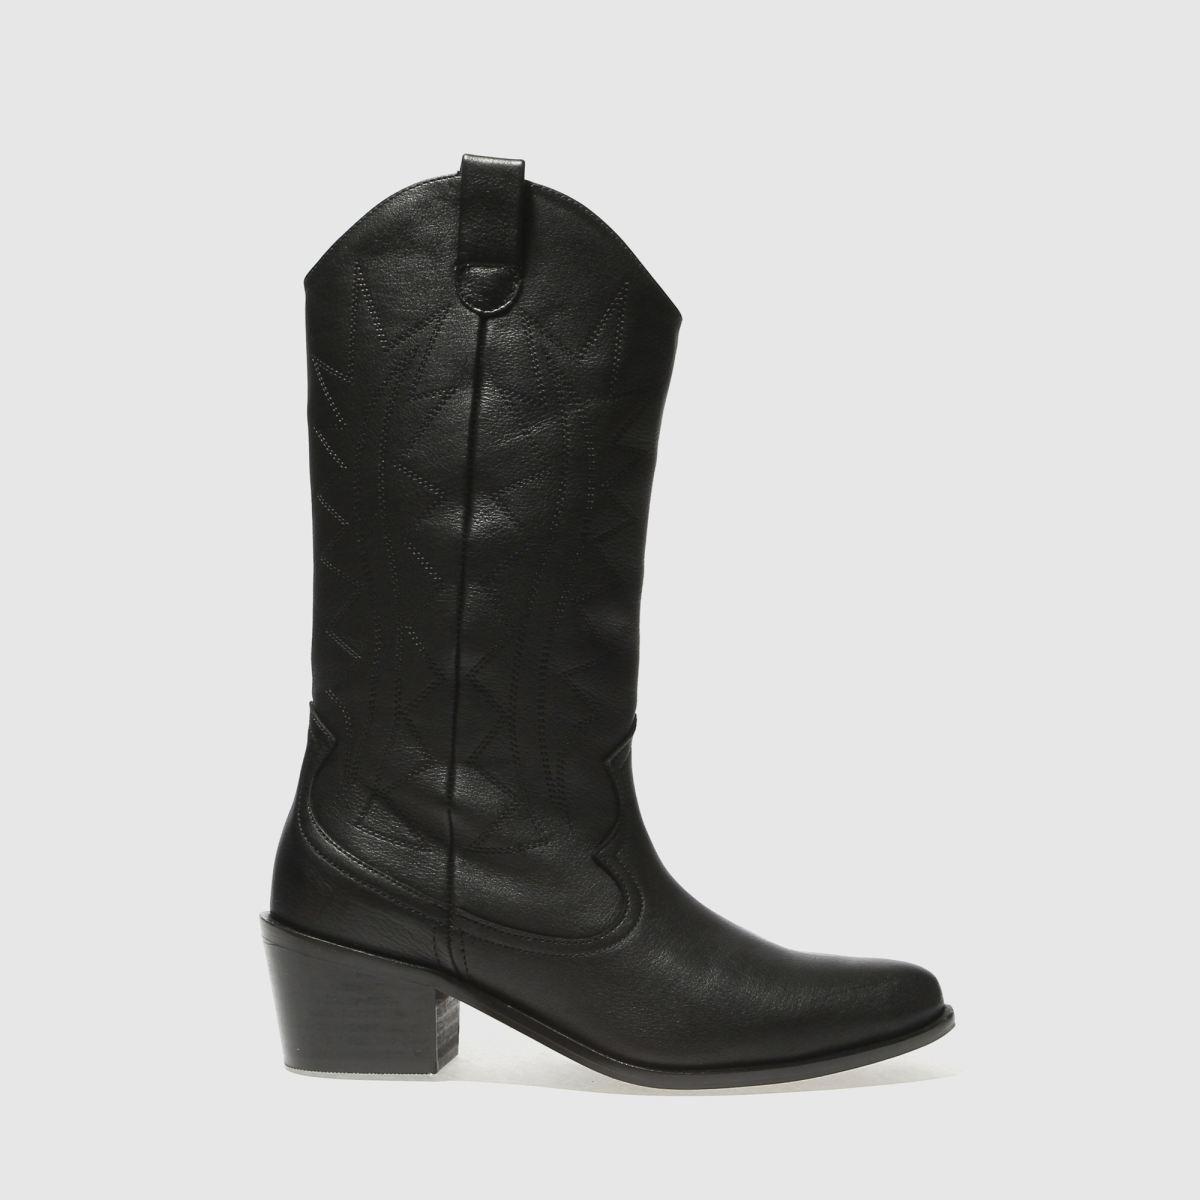 Schuh Black Ranchero Boots